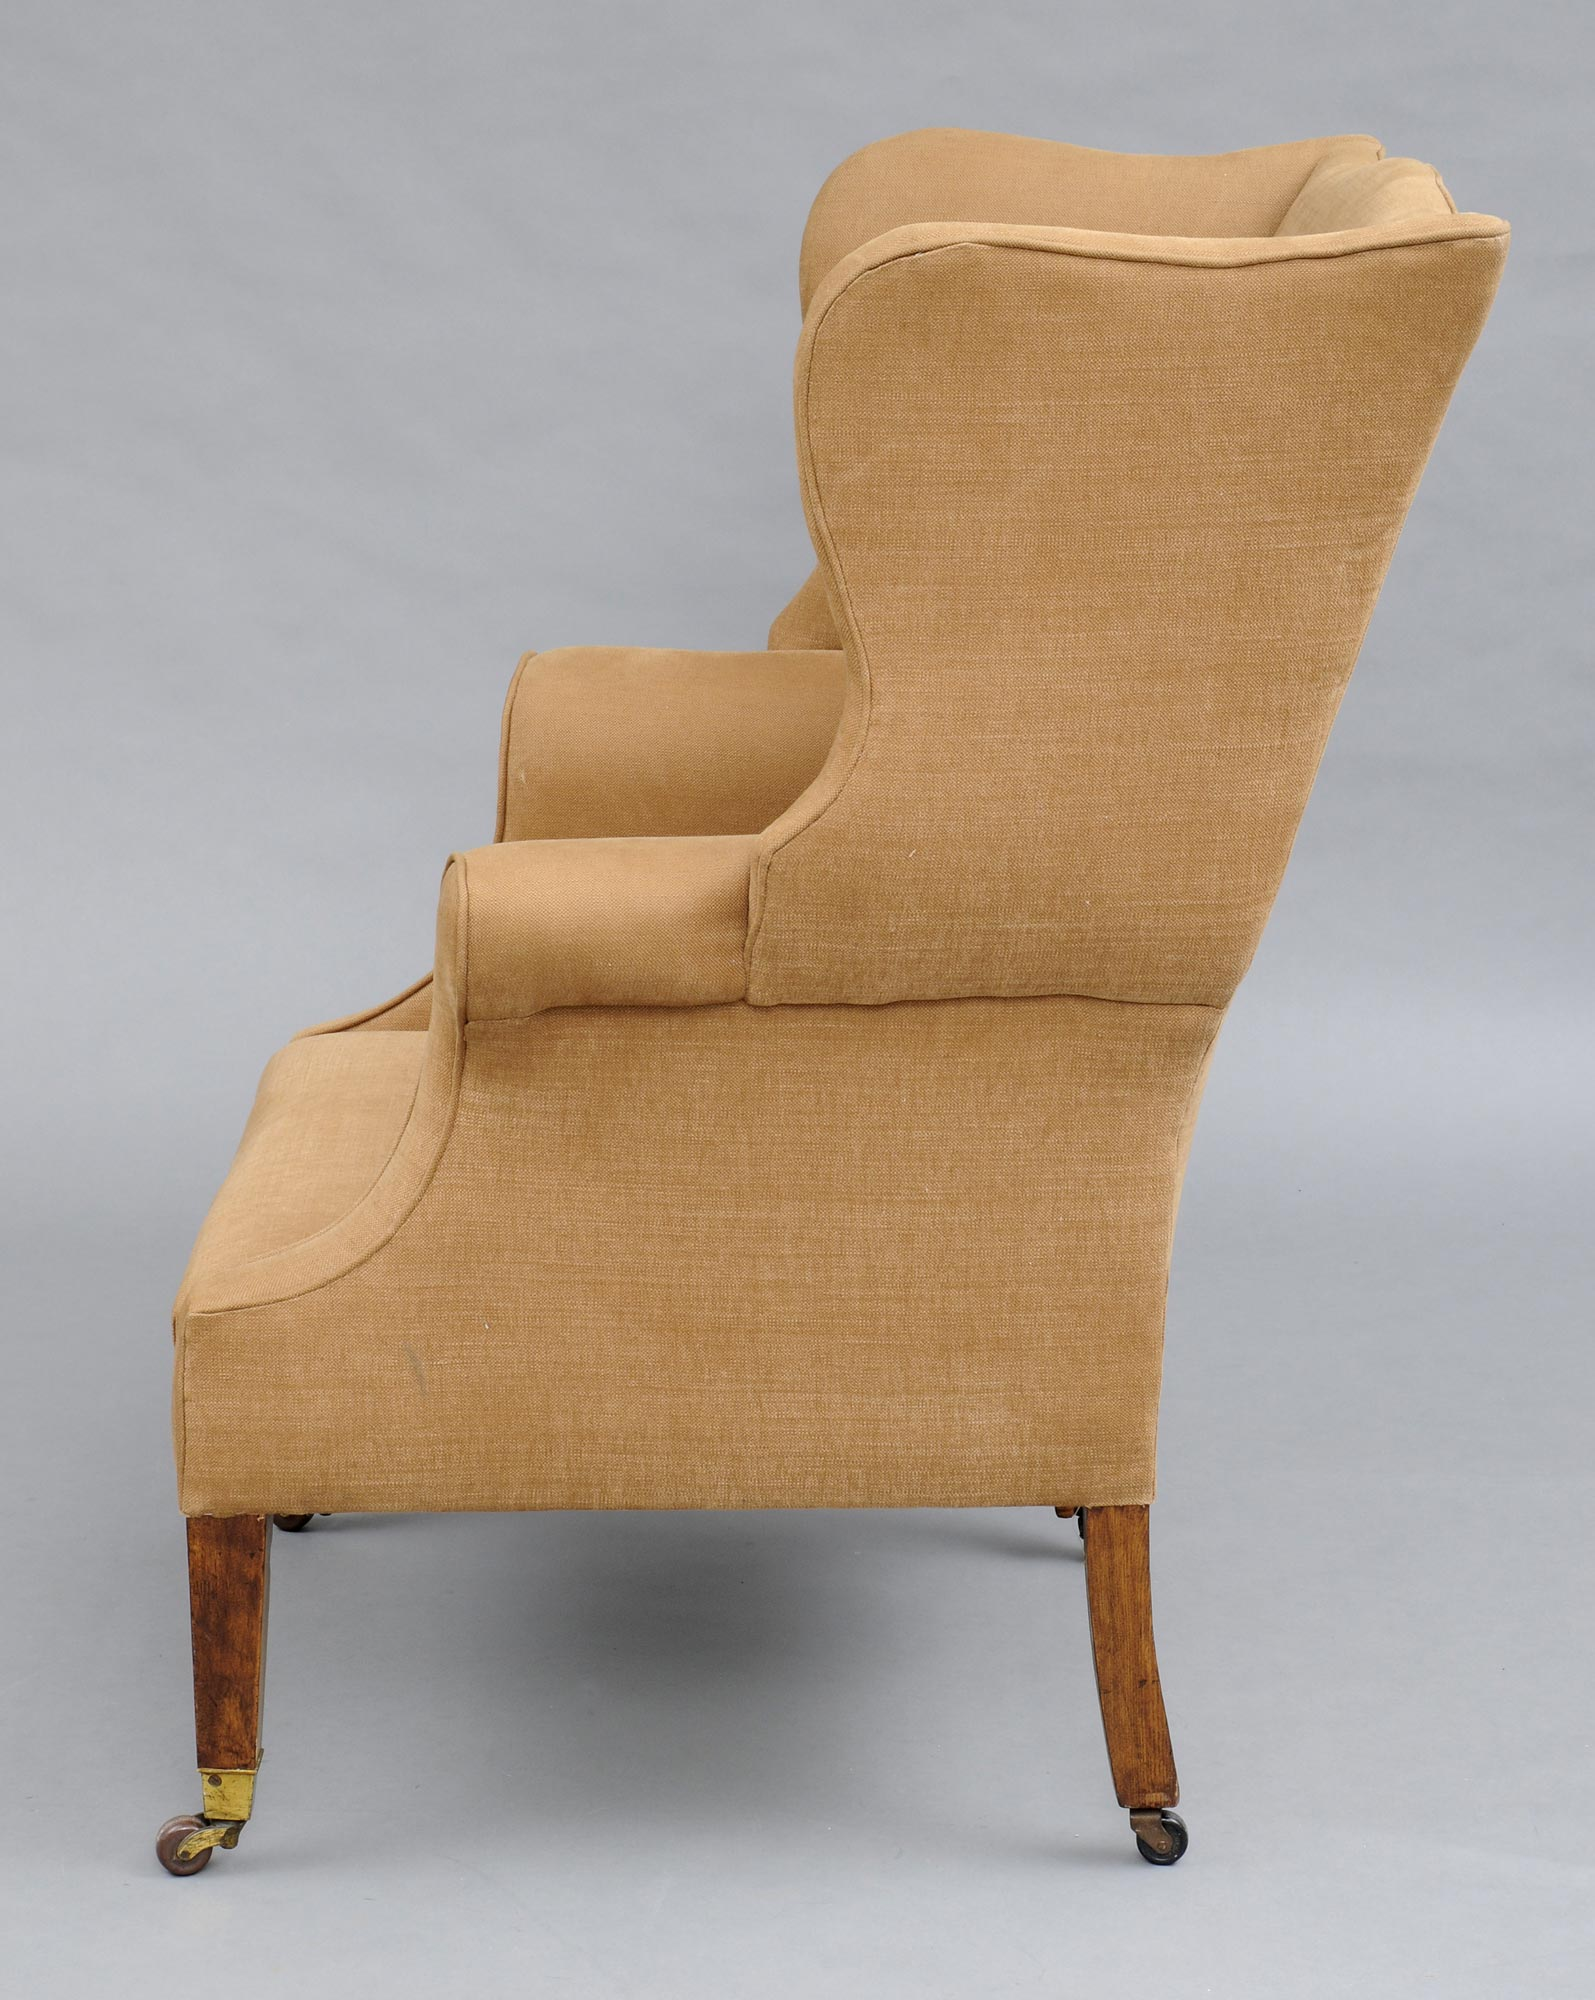 antique english george iii style mahogany u0026 ash wing chair 19th century